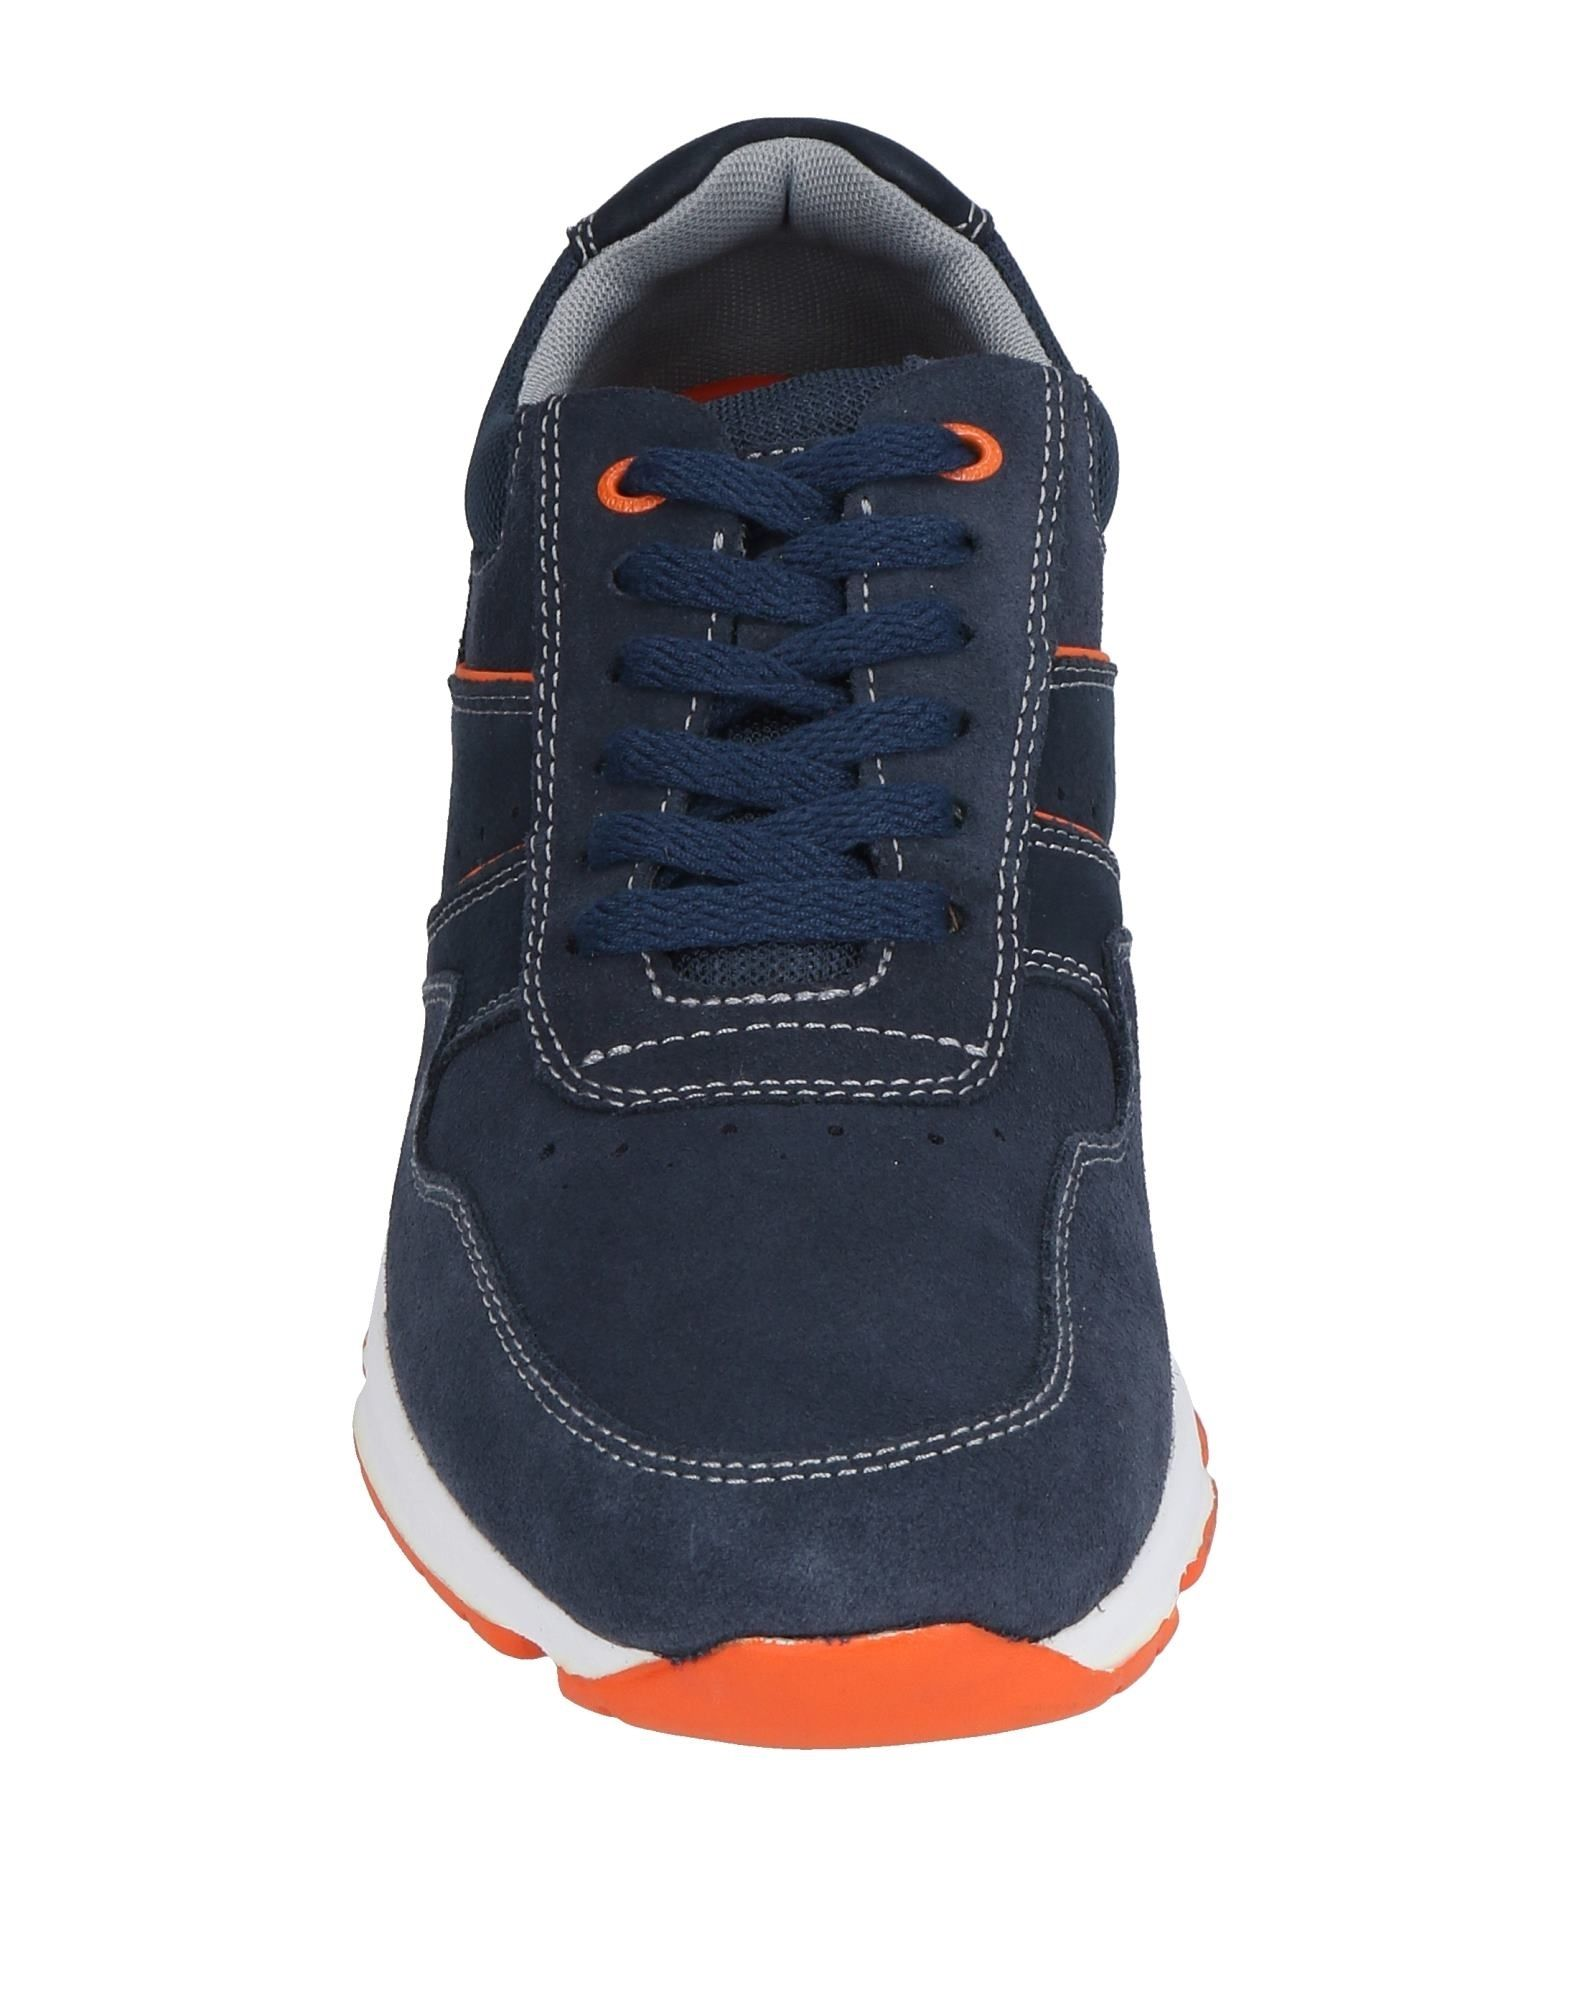 11509102SG Rockport Sneakers Herren  11509102SG  Heiße Schuhe 87bb90